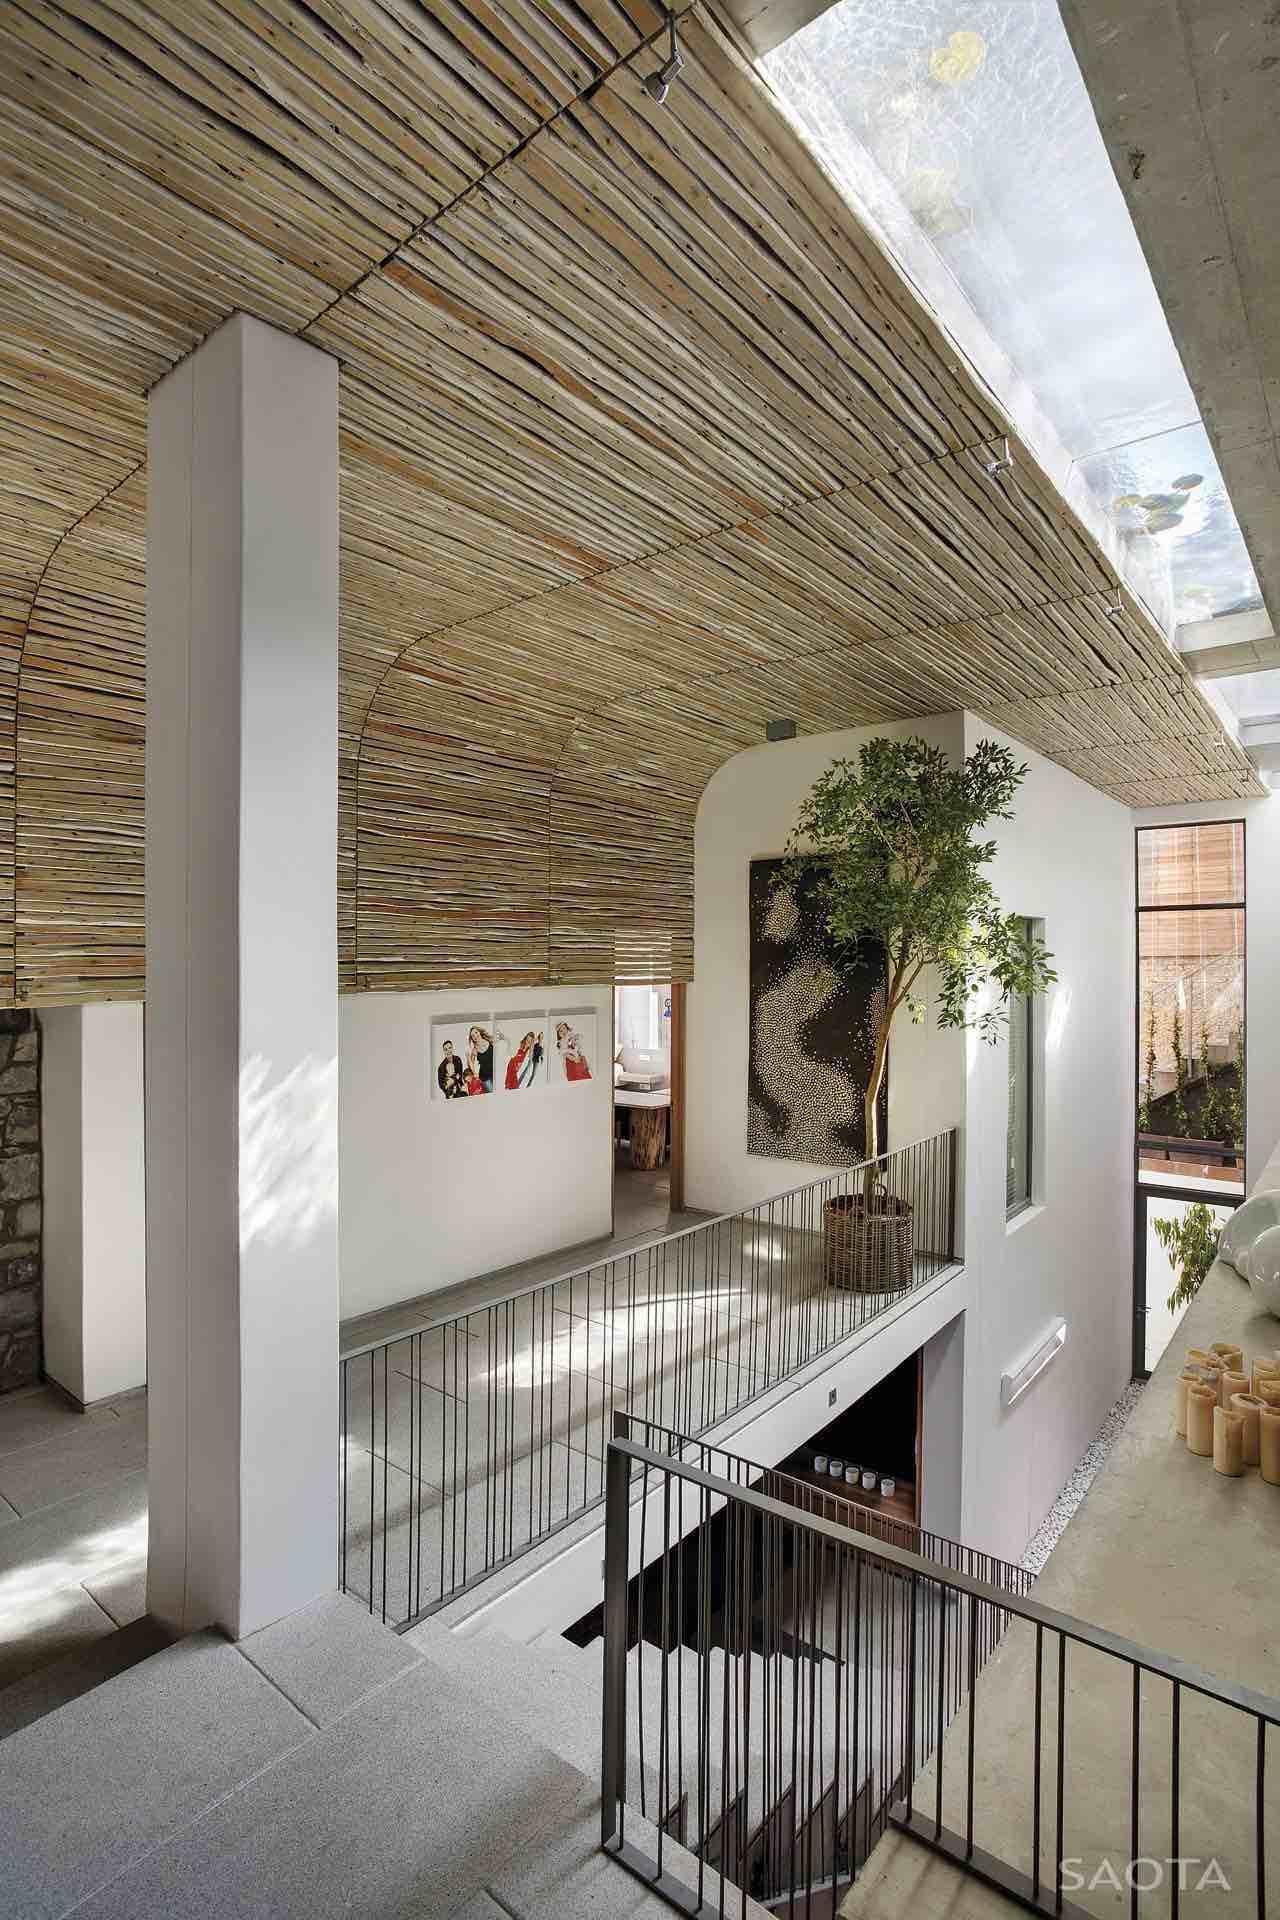 de-wet-34-saota-stefan-antoni-olmesdahl-truen-architects_dewet34_1a_int_gf002_atrium_001_al